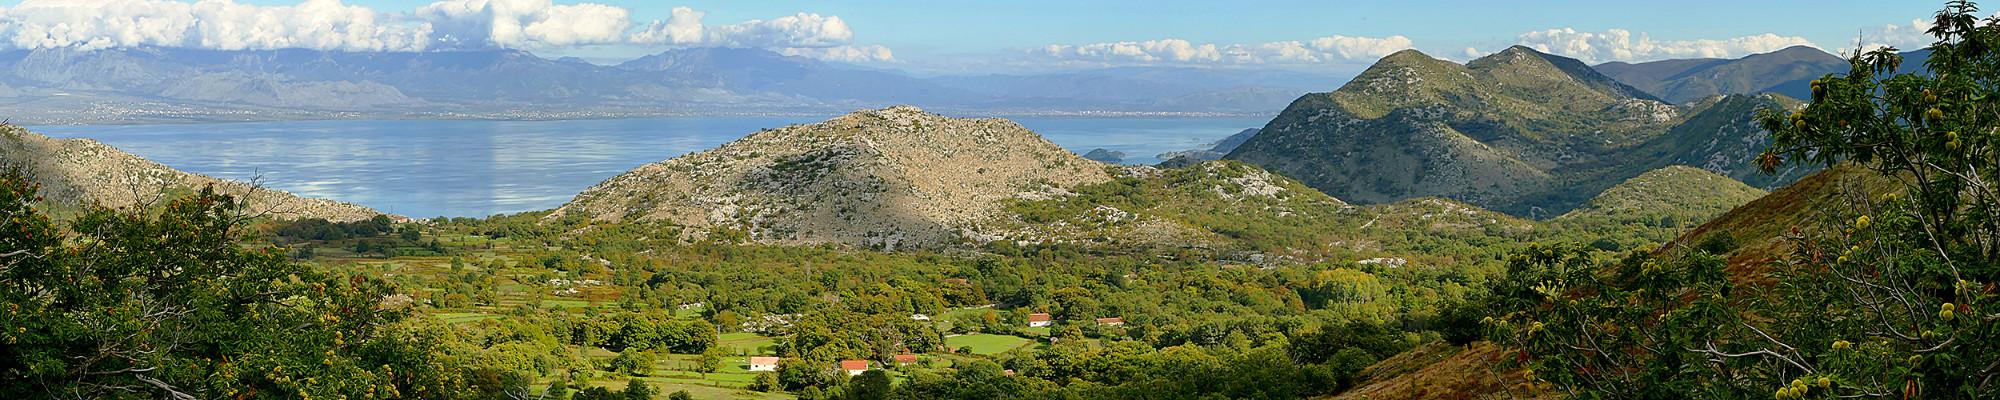 Montenegro_Skutarisee